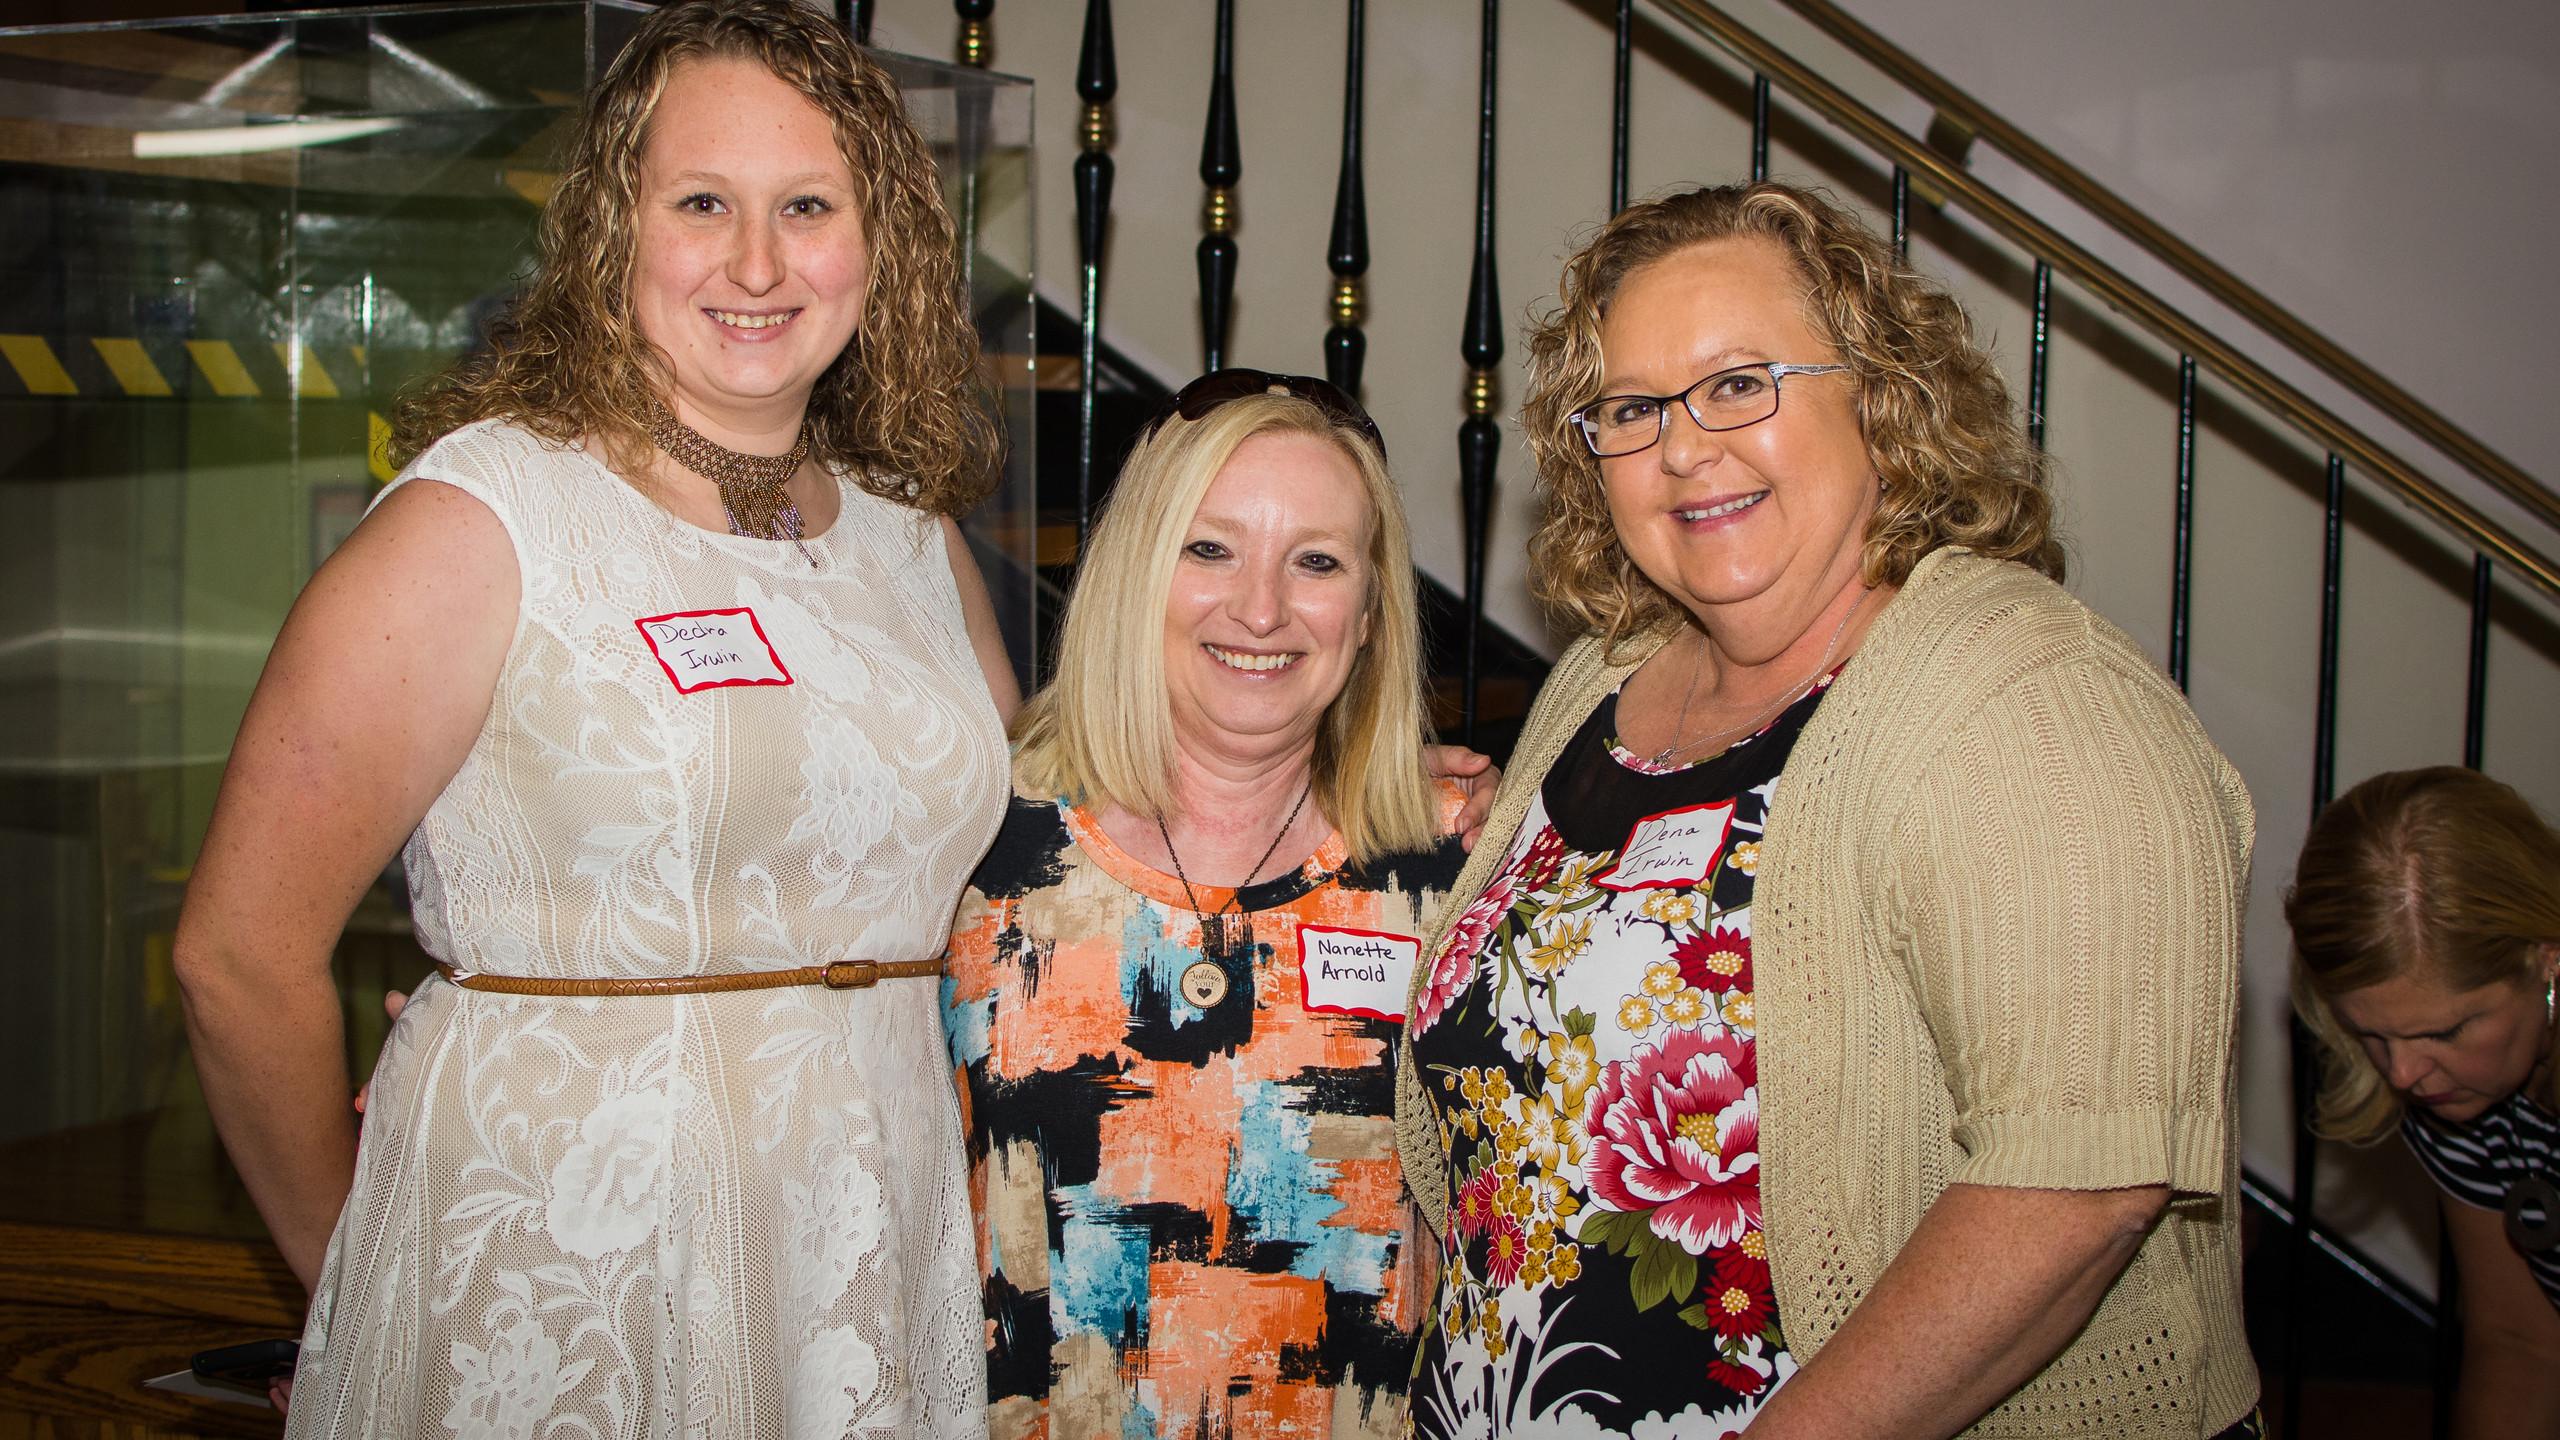 Dedra  Irwin, Nanette Arnold, and Dena I